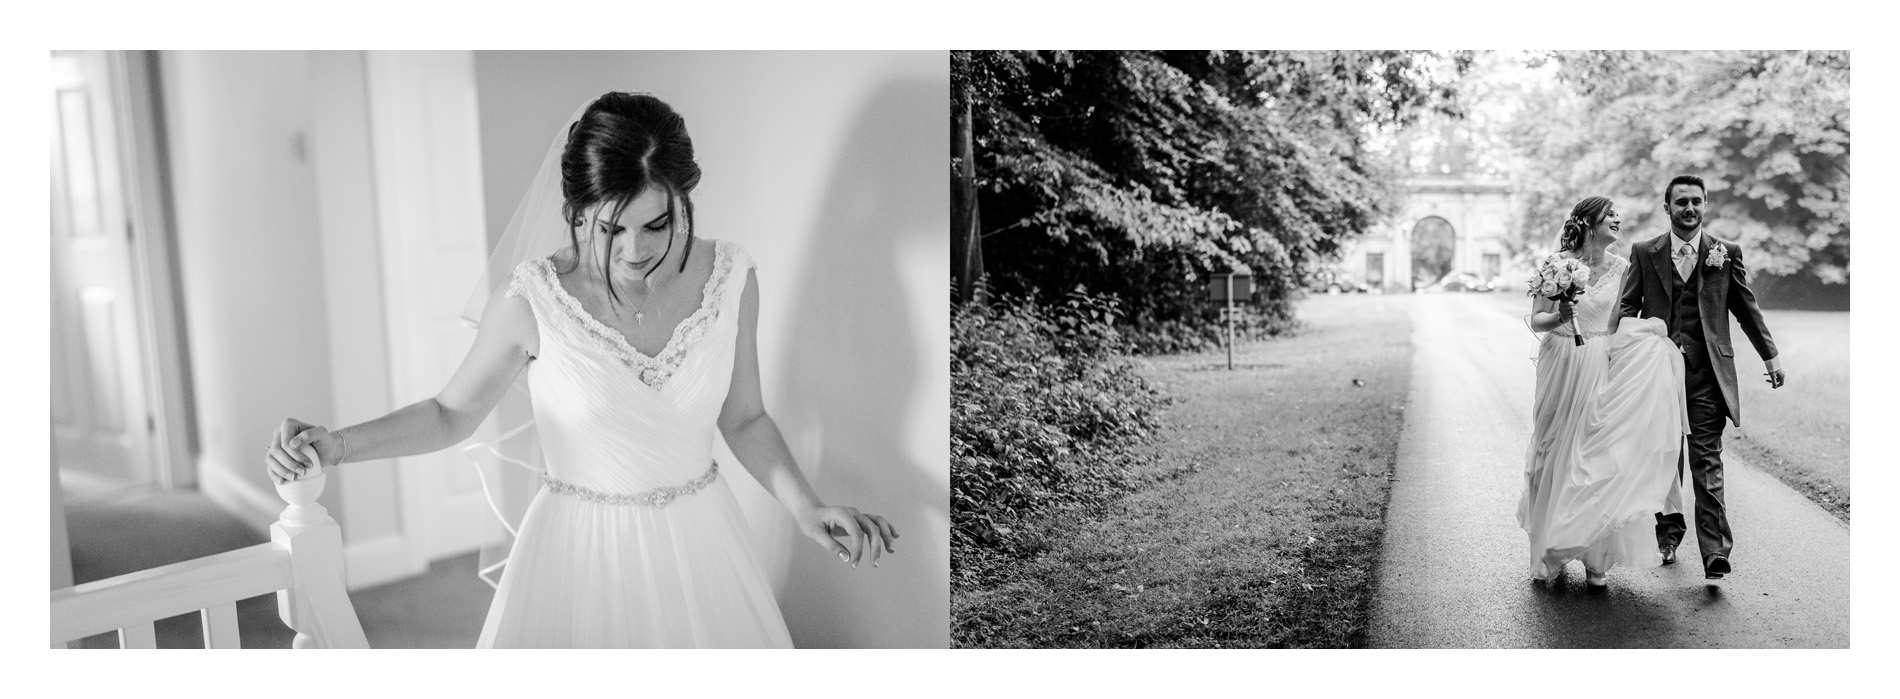 Wedding-Pairs-0004.jpg